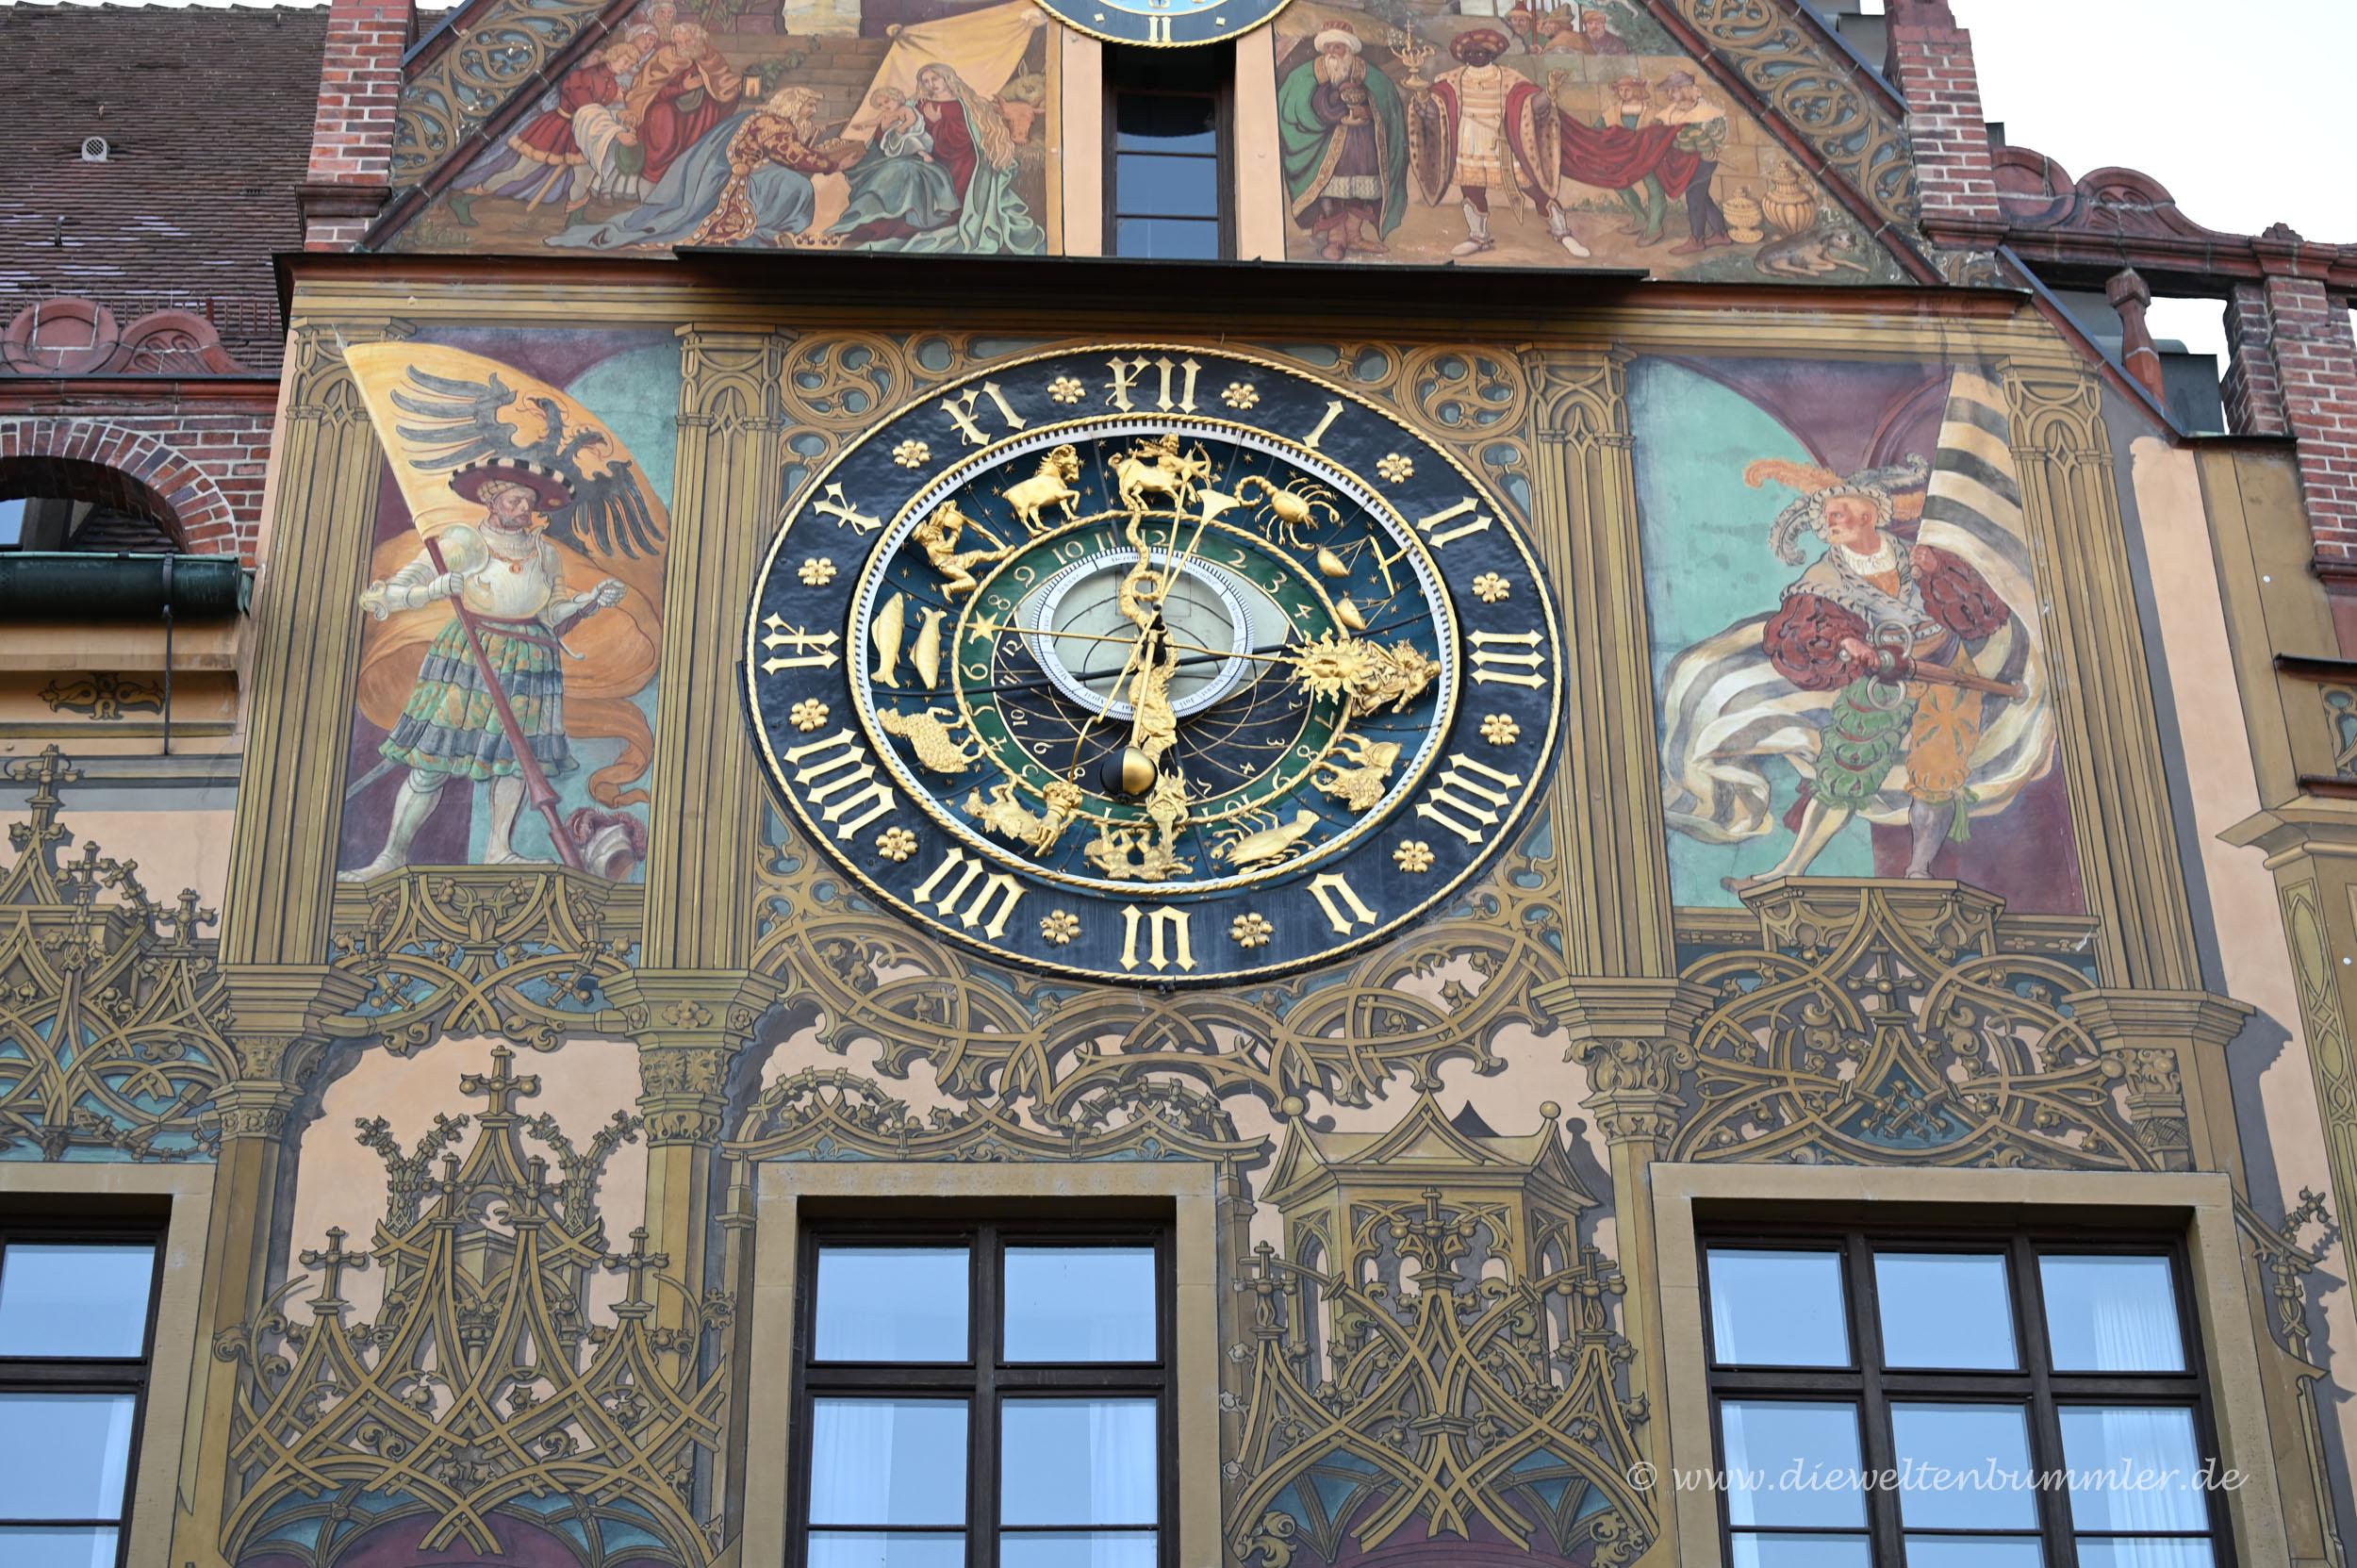 Uhr in Ulm